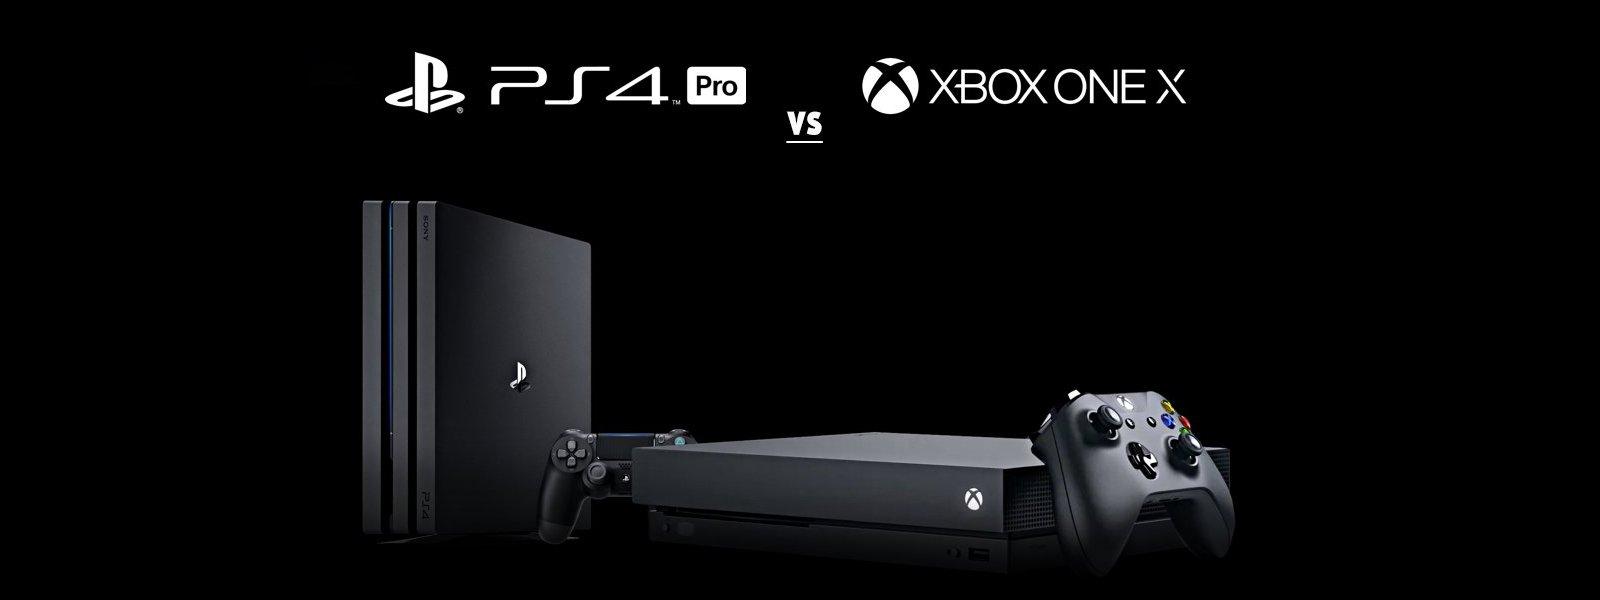 Xbox-one-x-vs-ps4-pro